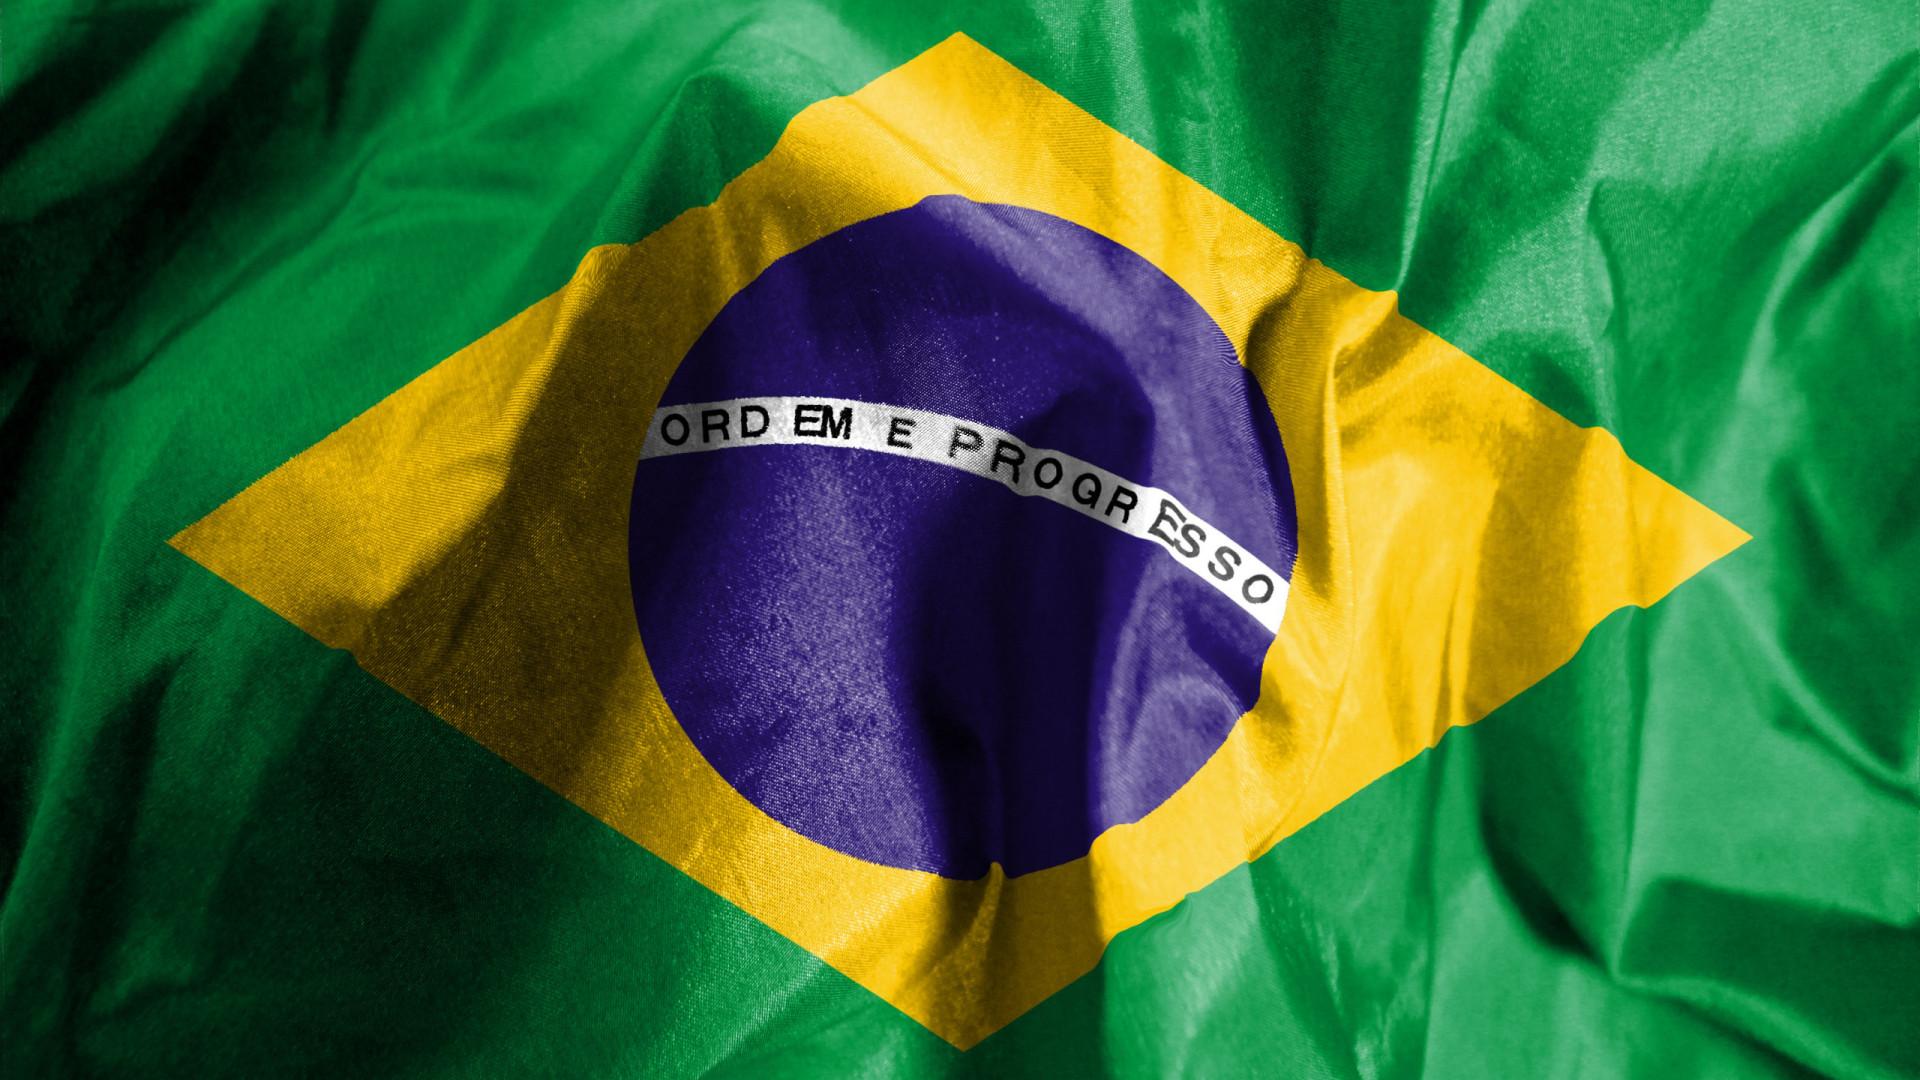 Embaixador na Venezuela 'persona non grata'? Brasil promete retaliar